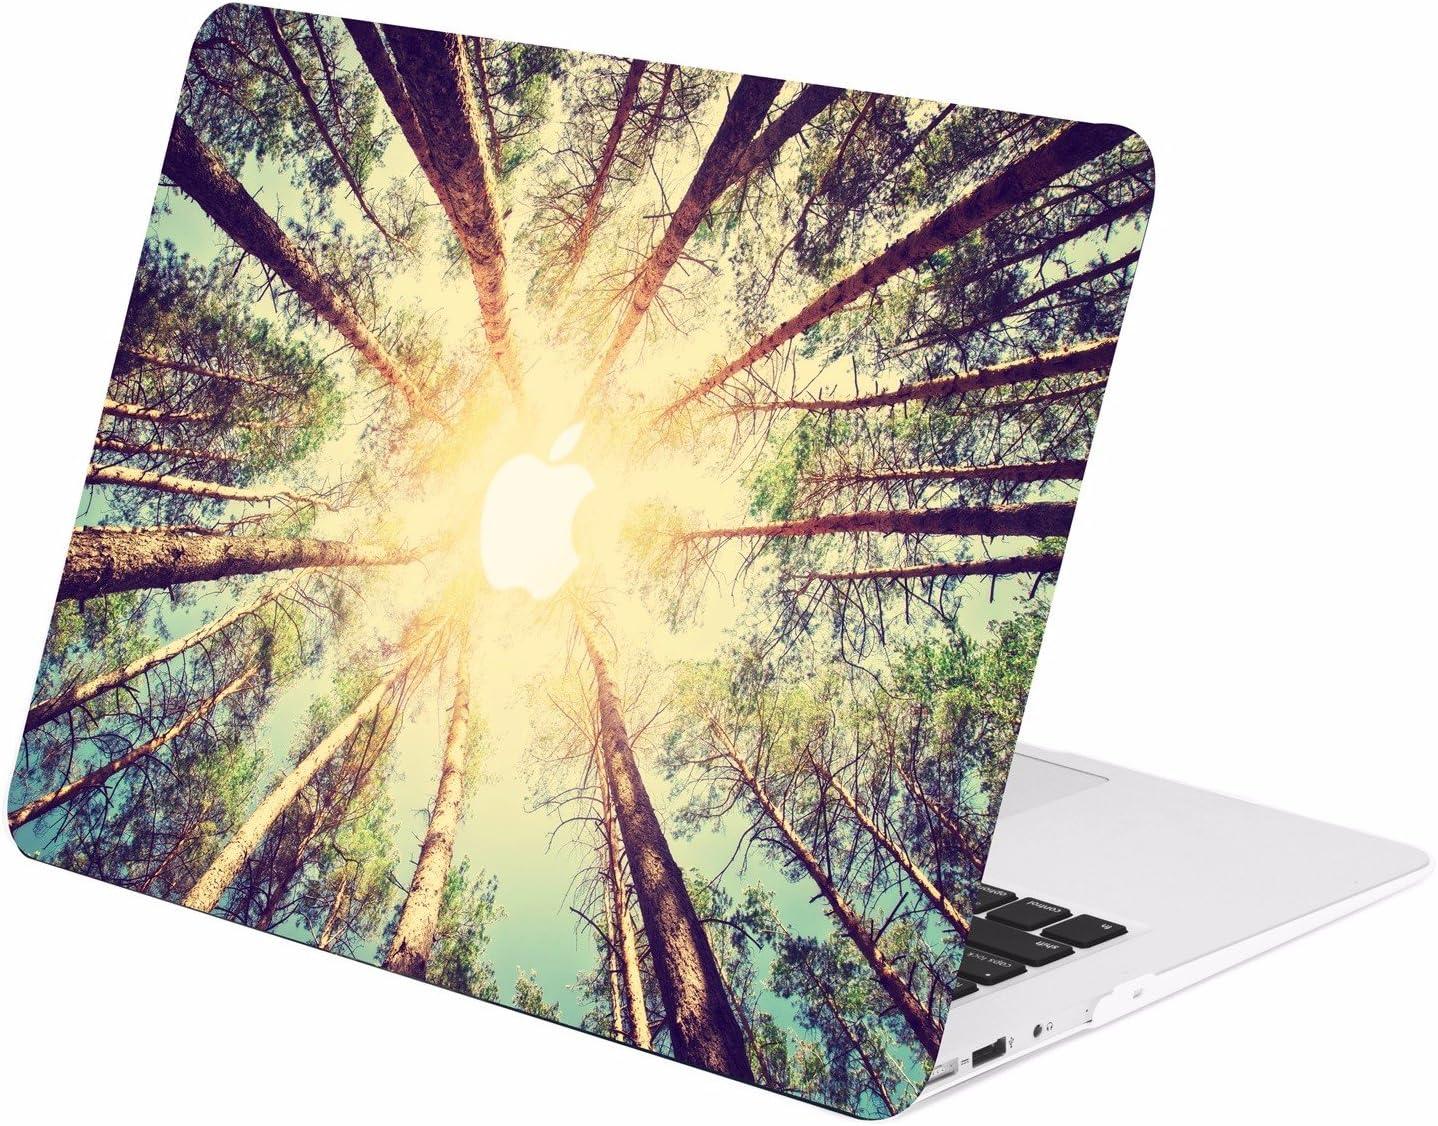 "TOP CASE - Autumn Spectrum Graphic Rubberized Hard Case Compatible Older Generation MacBook Air 13"" A1369 / A1466 (Release 2010-2017) – Autumn Compatibleest"